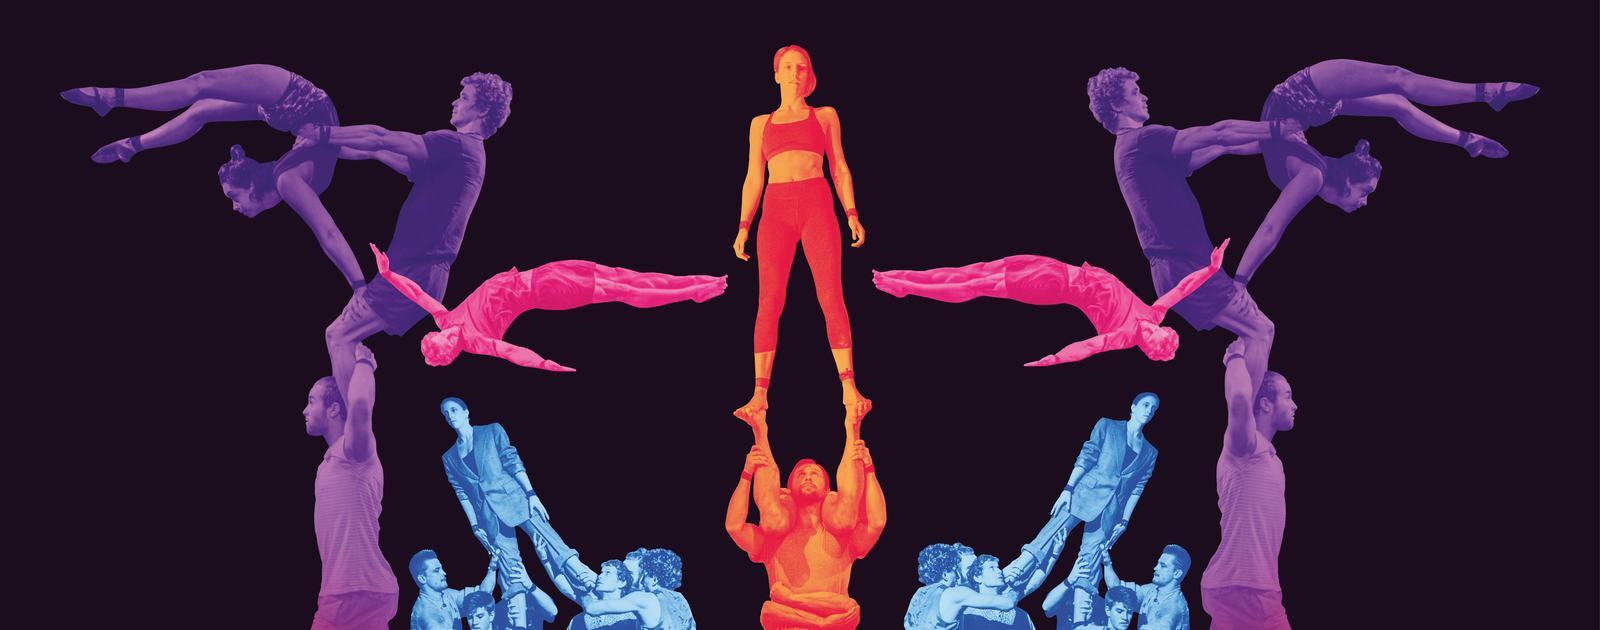 Acrobats, backbone performance